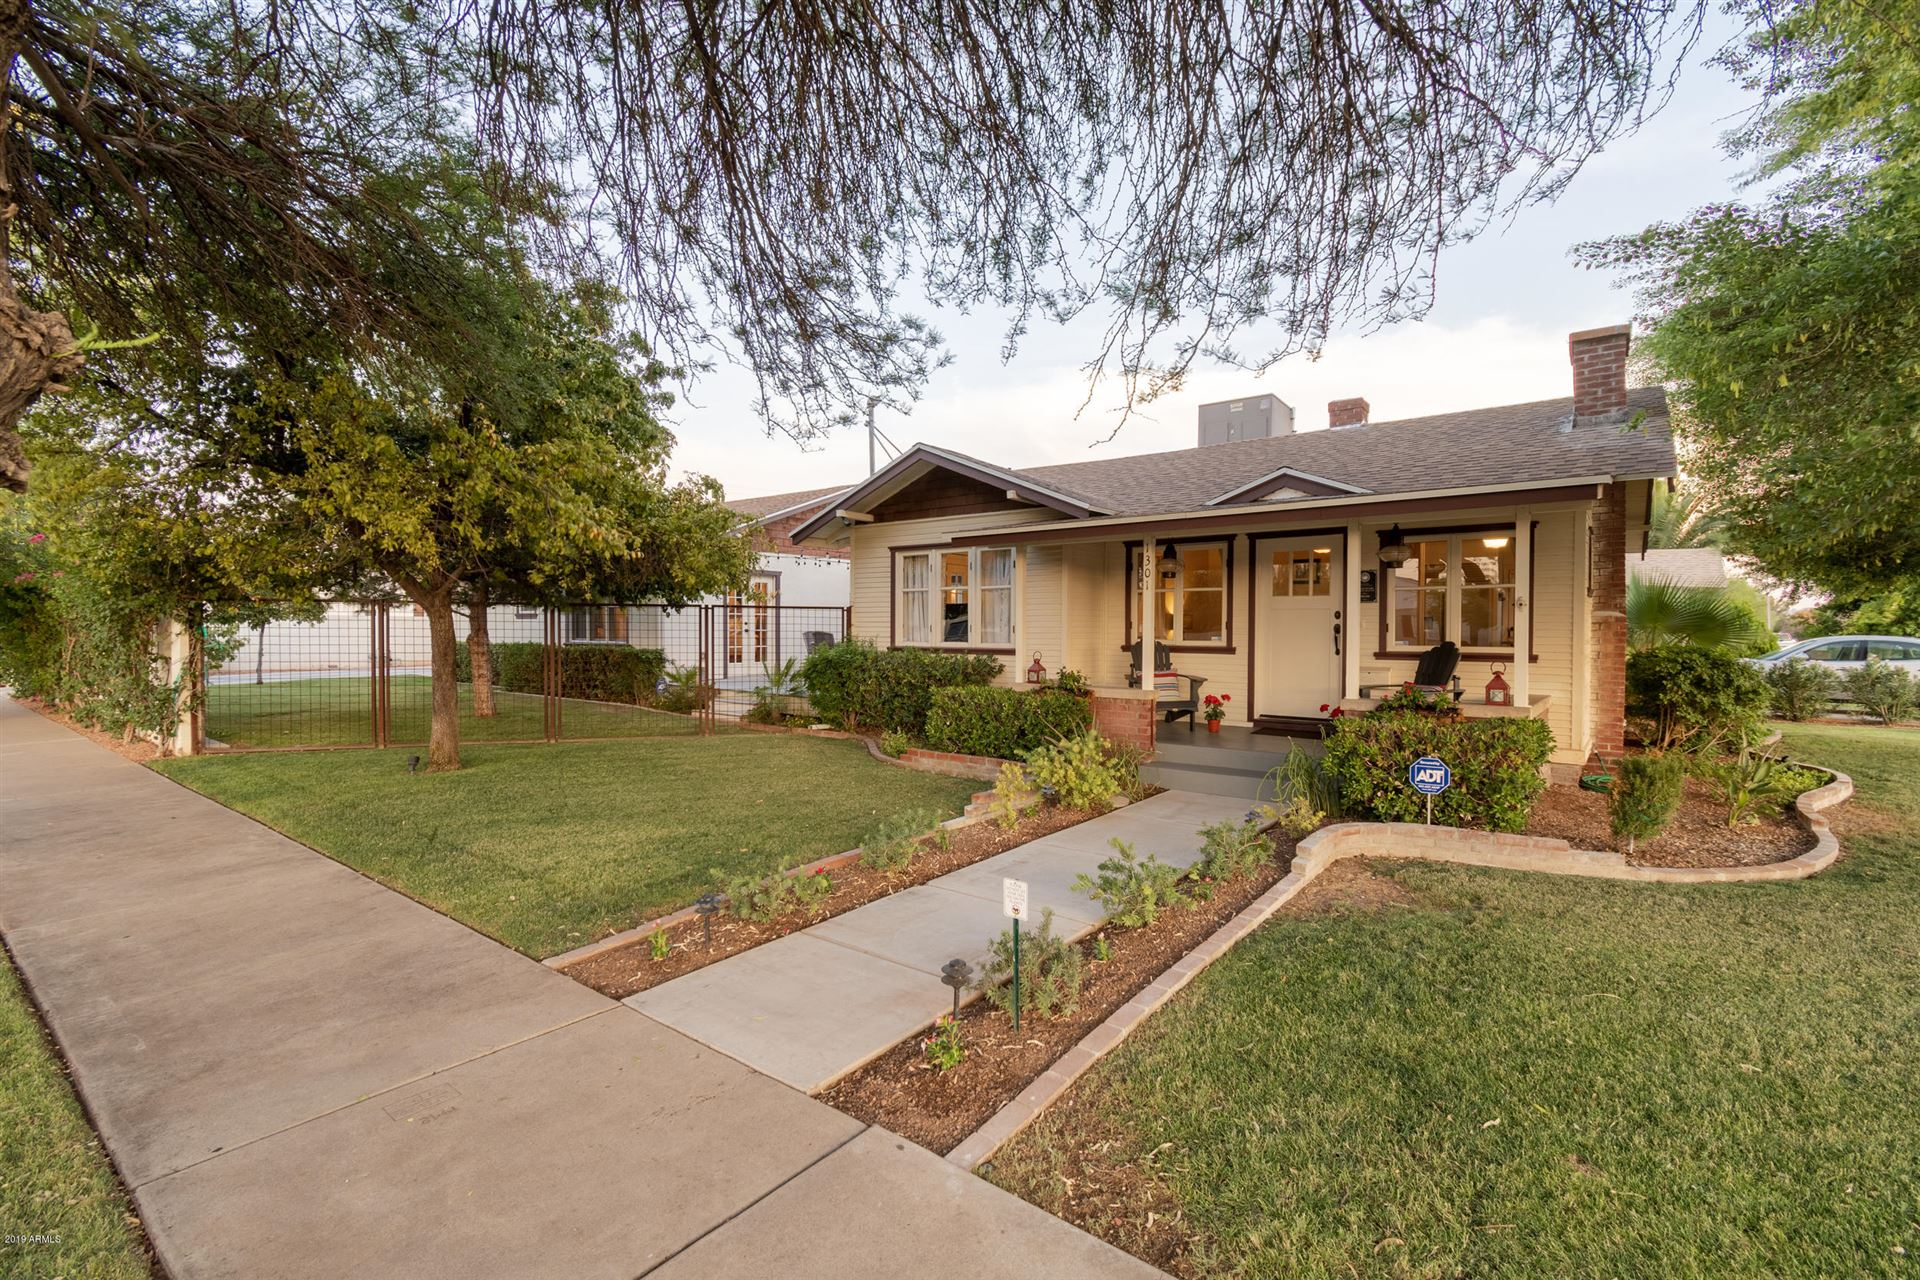 1301 E SHERIDAN Street, Phoenix, AZ 85006 - MLS#: 6198100